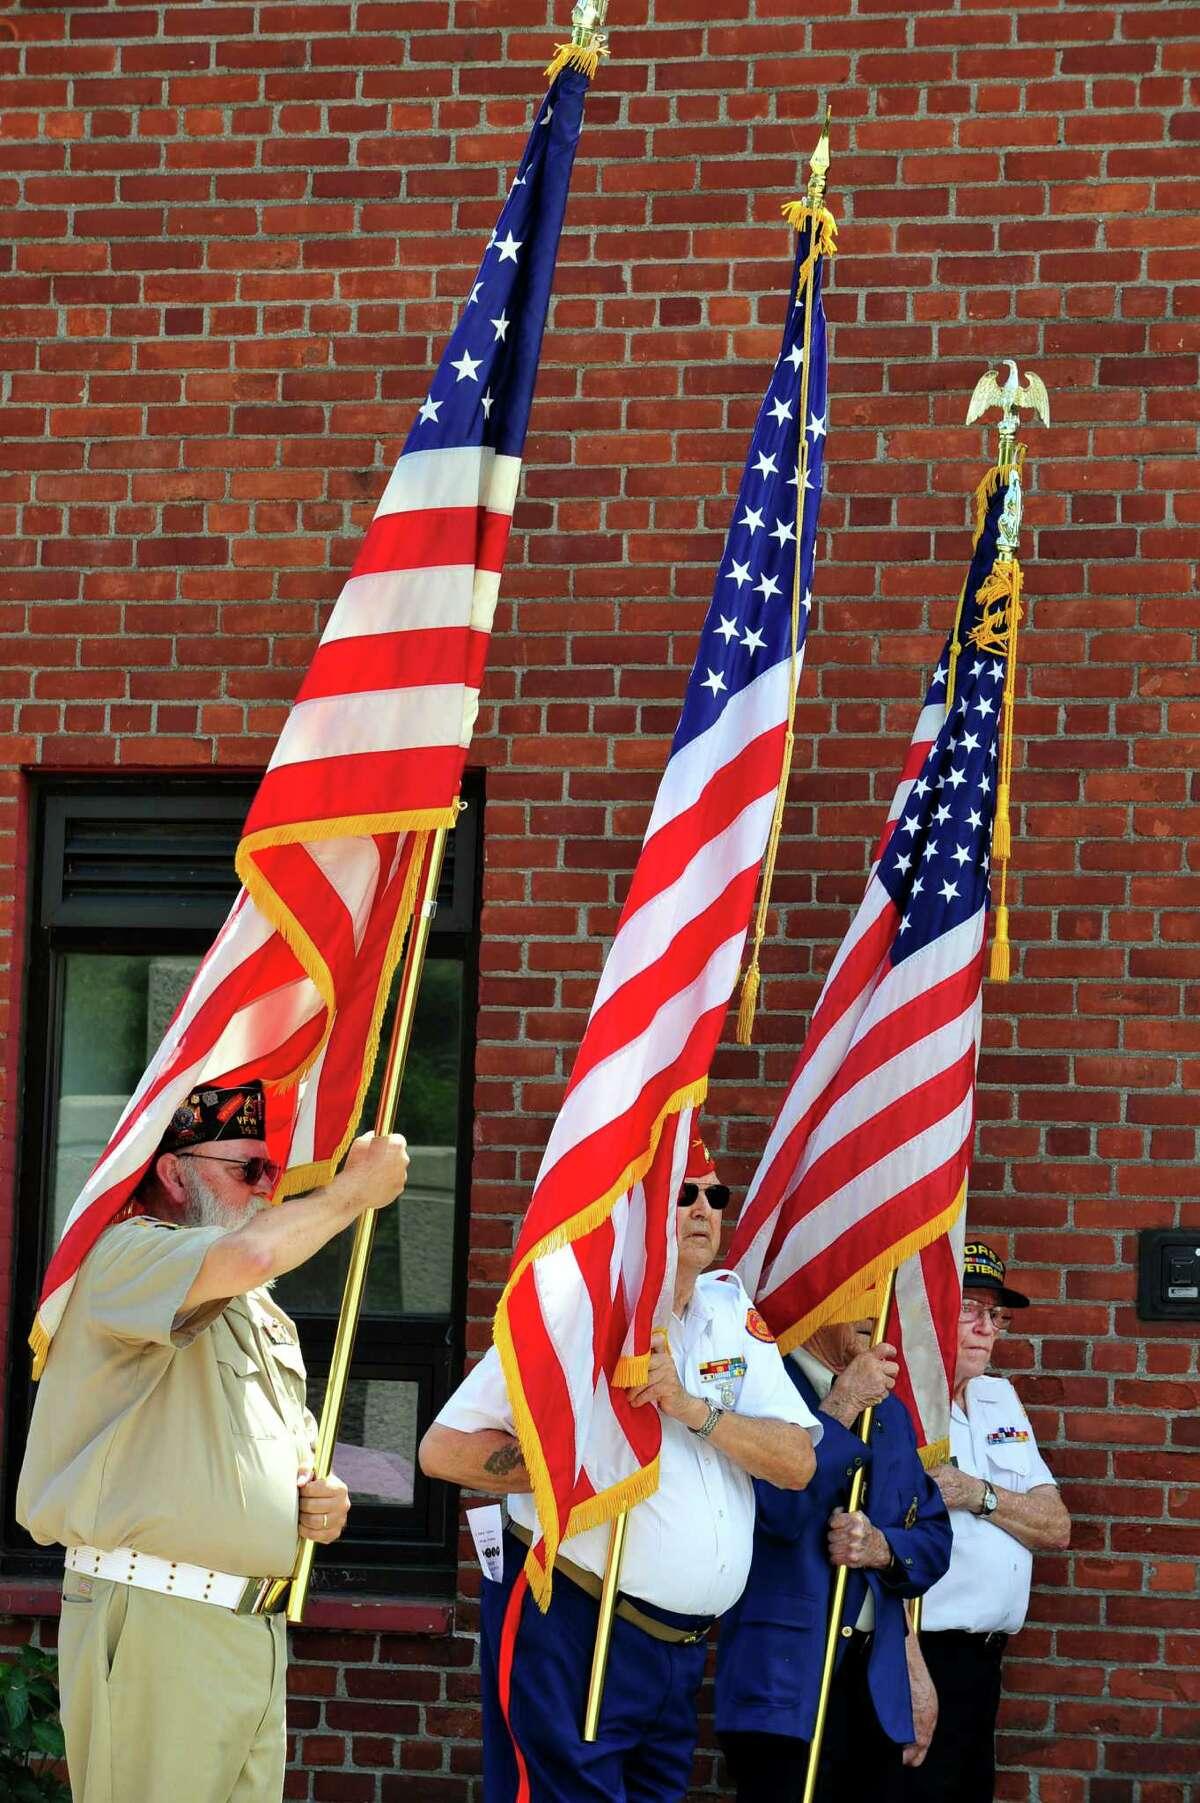 The Veterans Walkway of Honor dedication ceremony takes place at the Danbury War Memorial, in Danbury, Conn. Sunday, July 14, 2013.